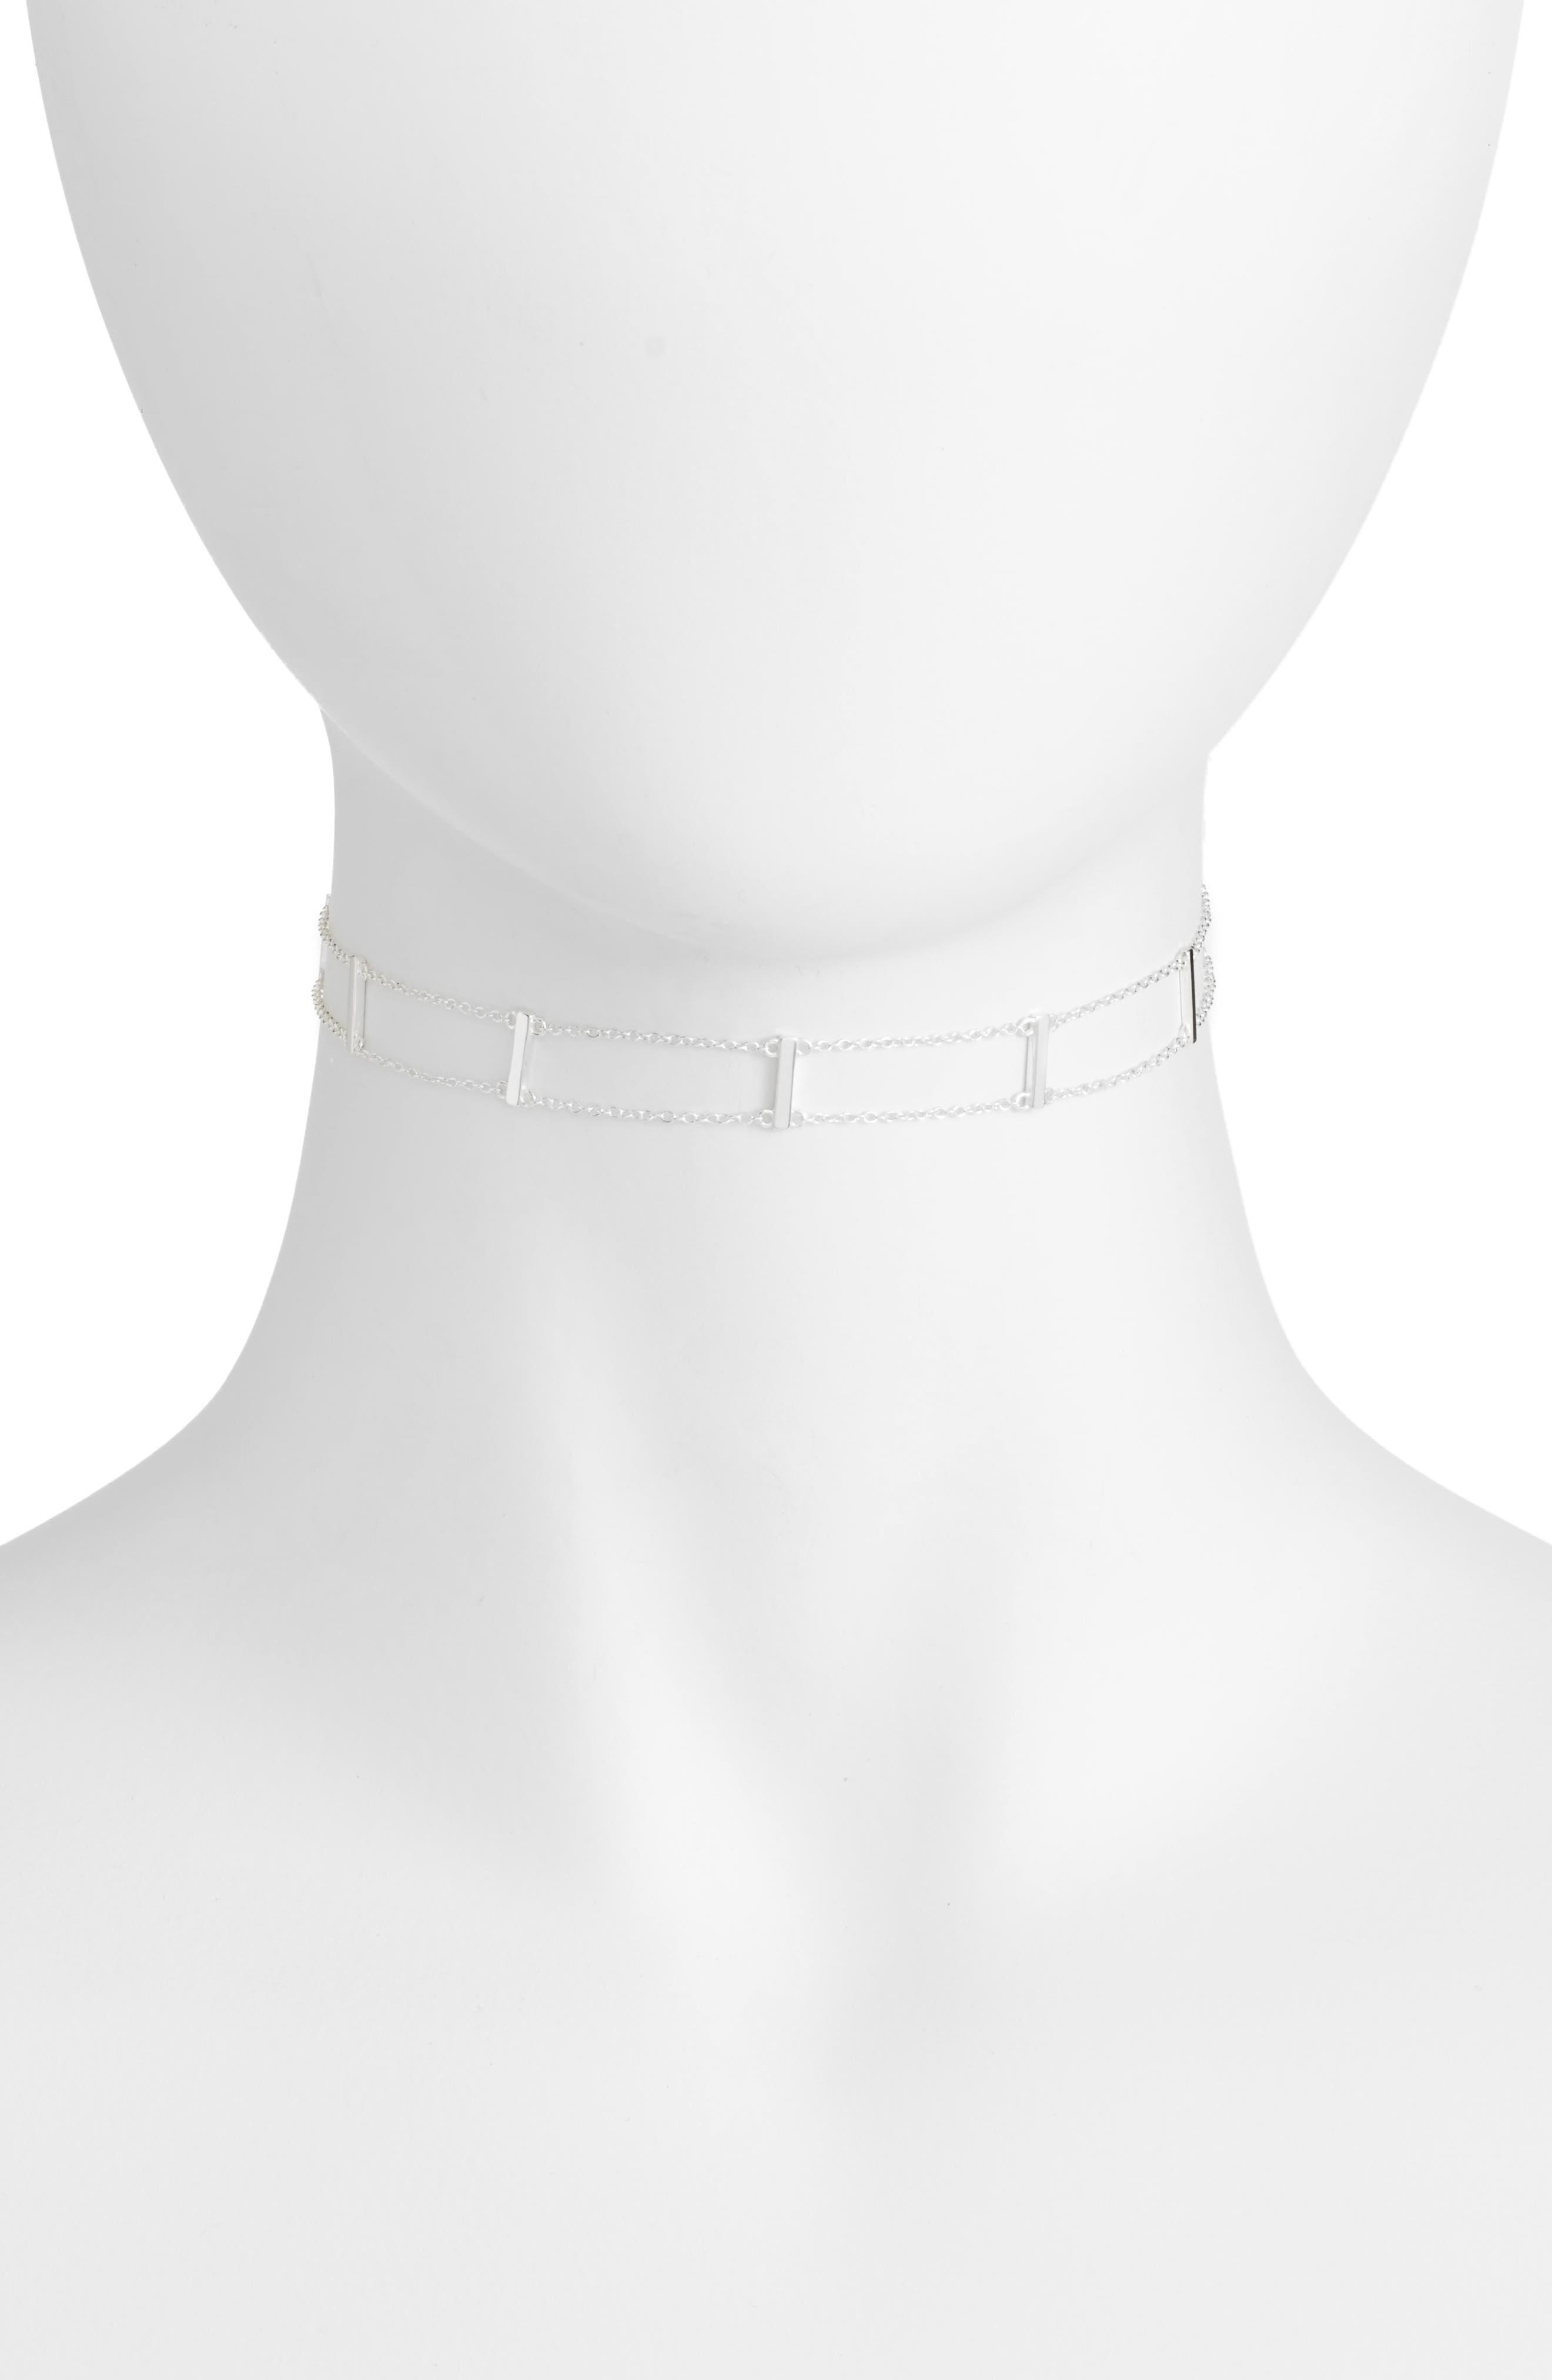 Alternate Image 1 Selected - Argento Vivo Chain Choker